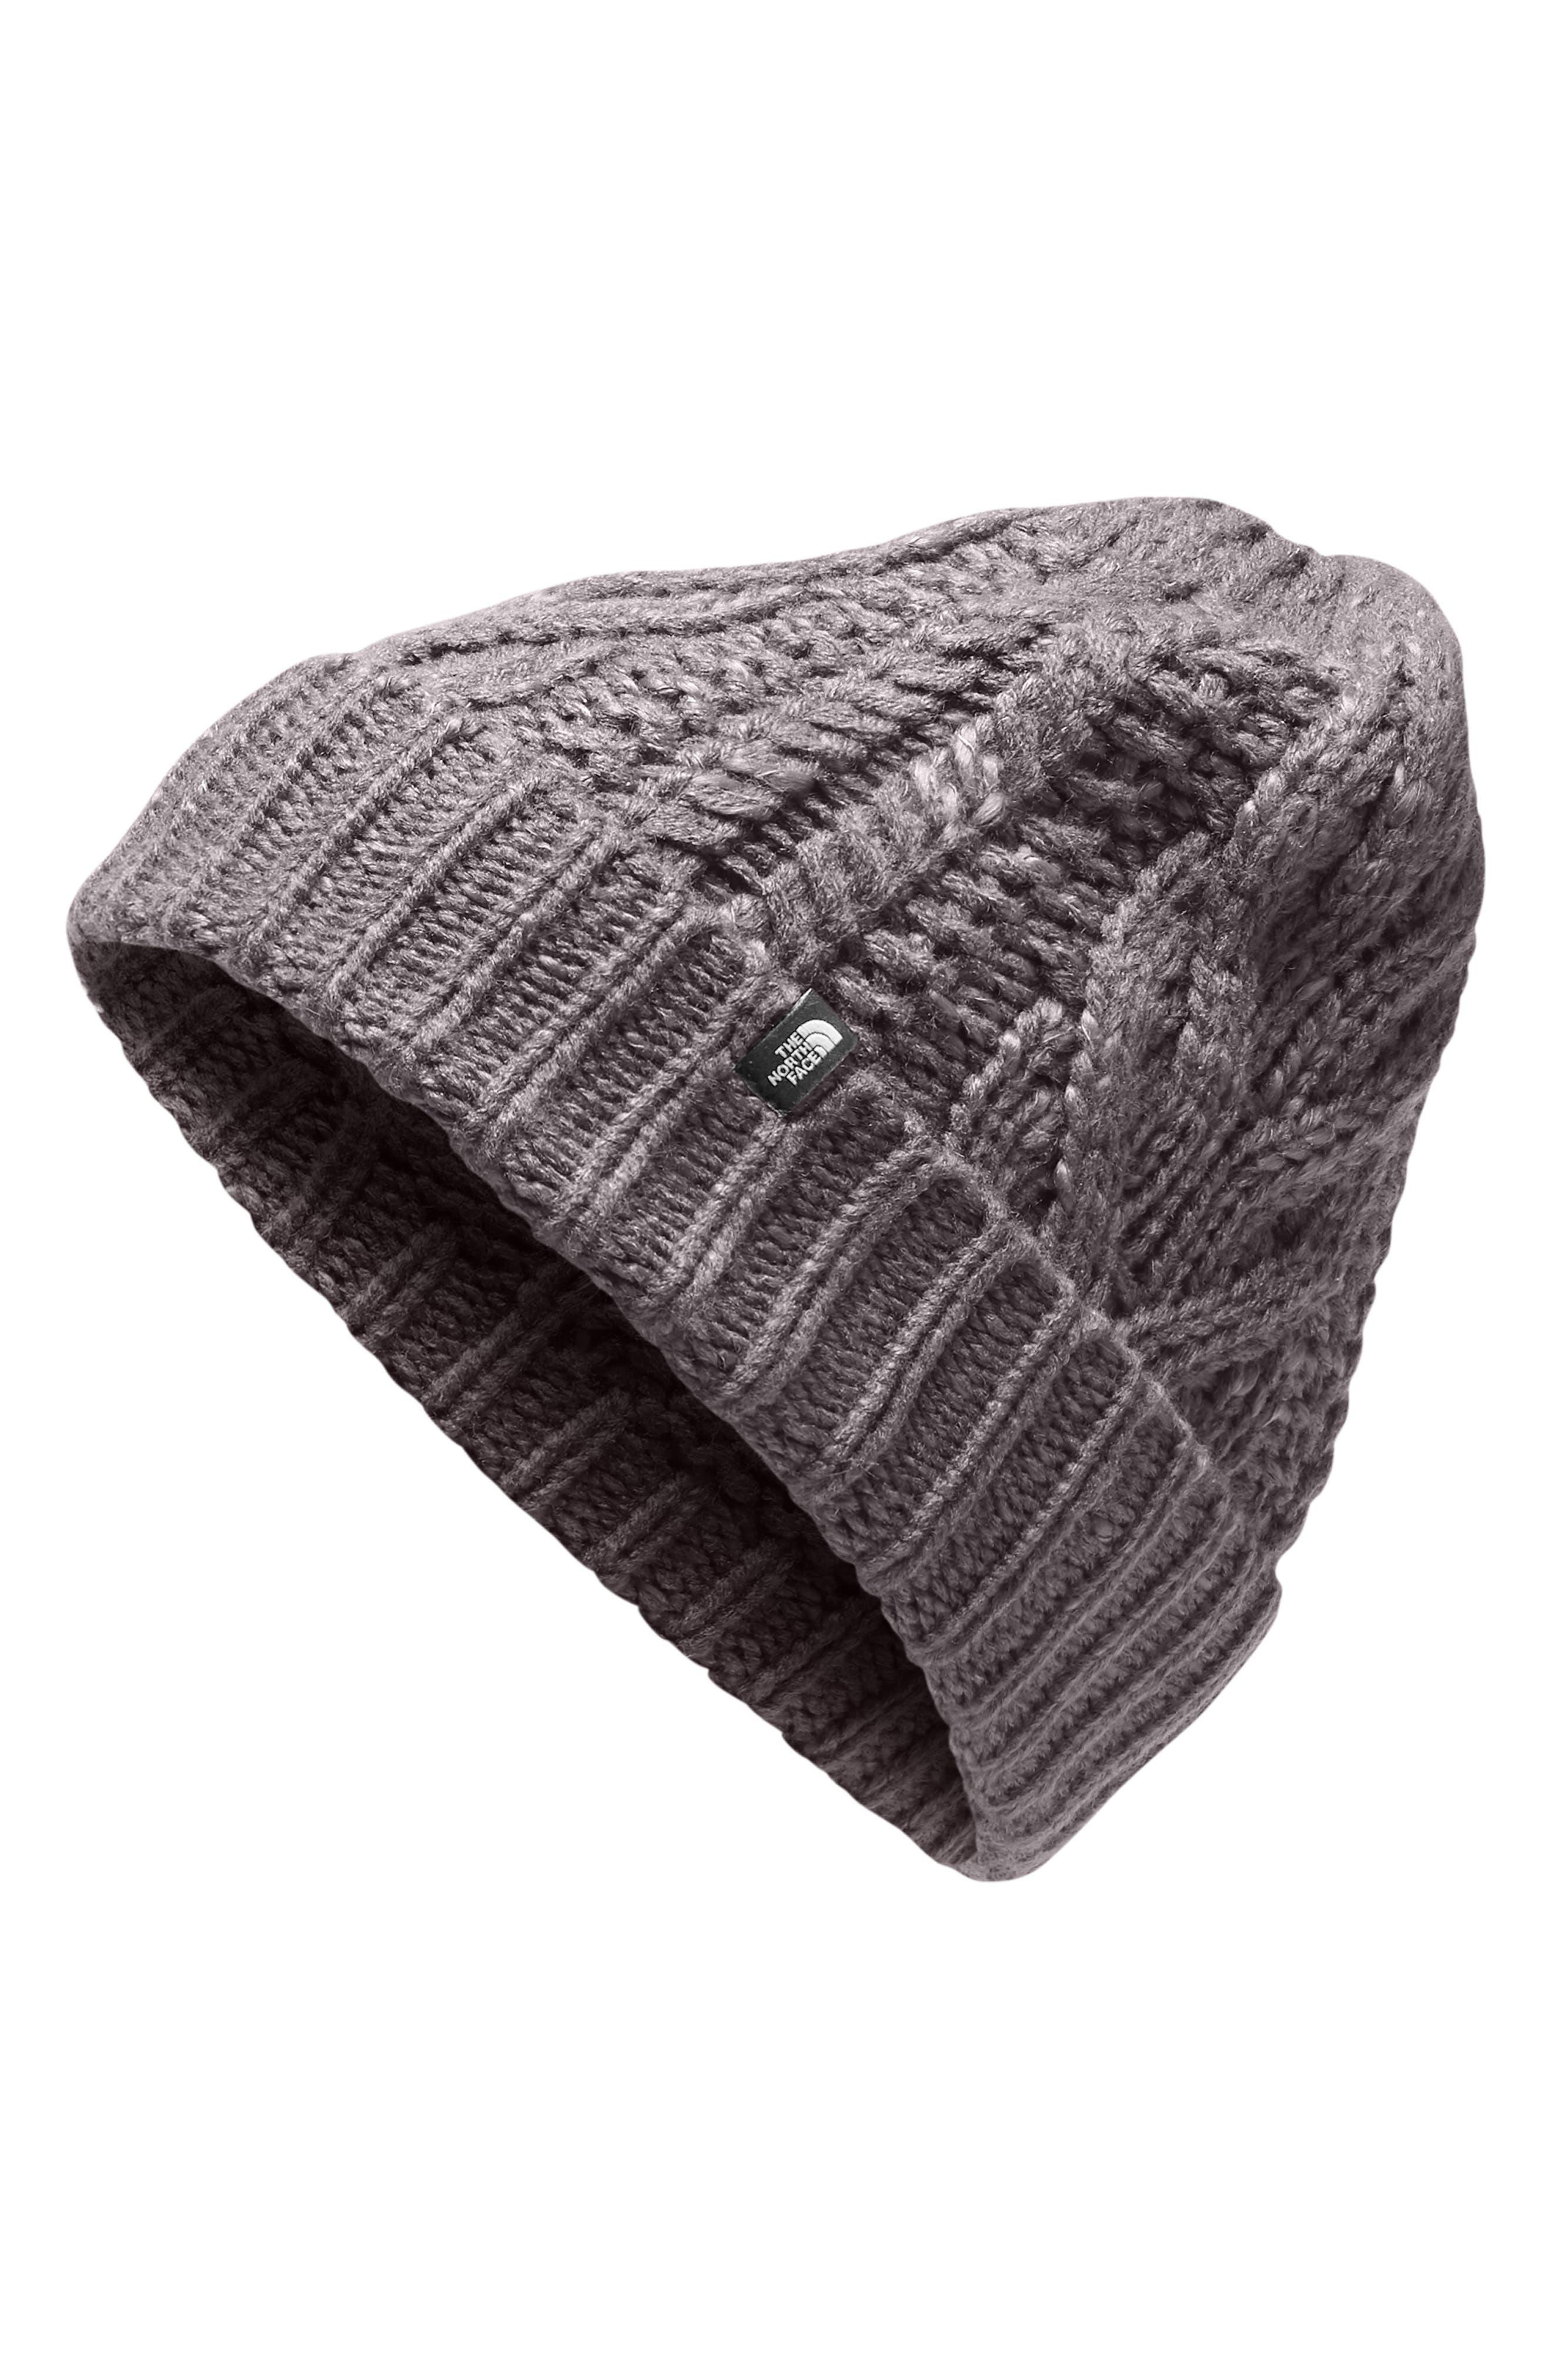 Minna Cable Knit Beanie,                         Main,                         color, RABBIT GREY